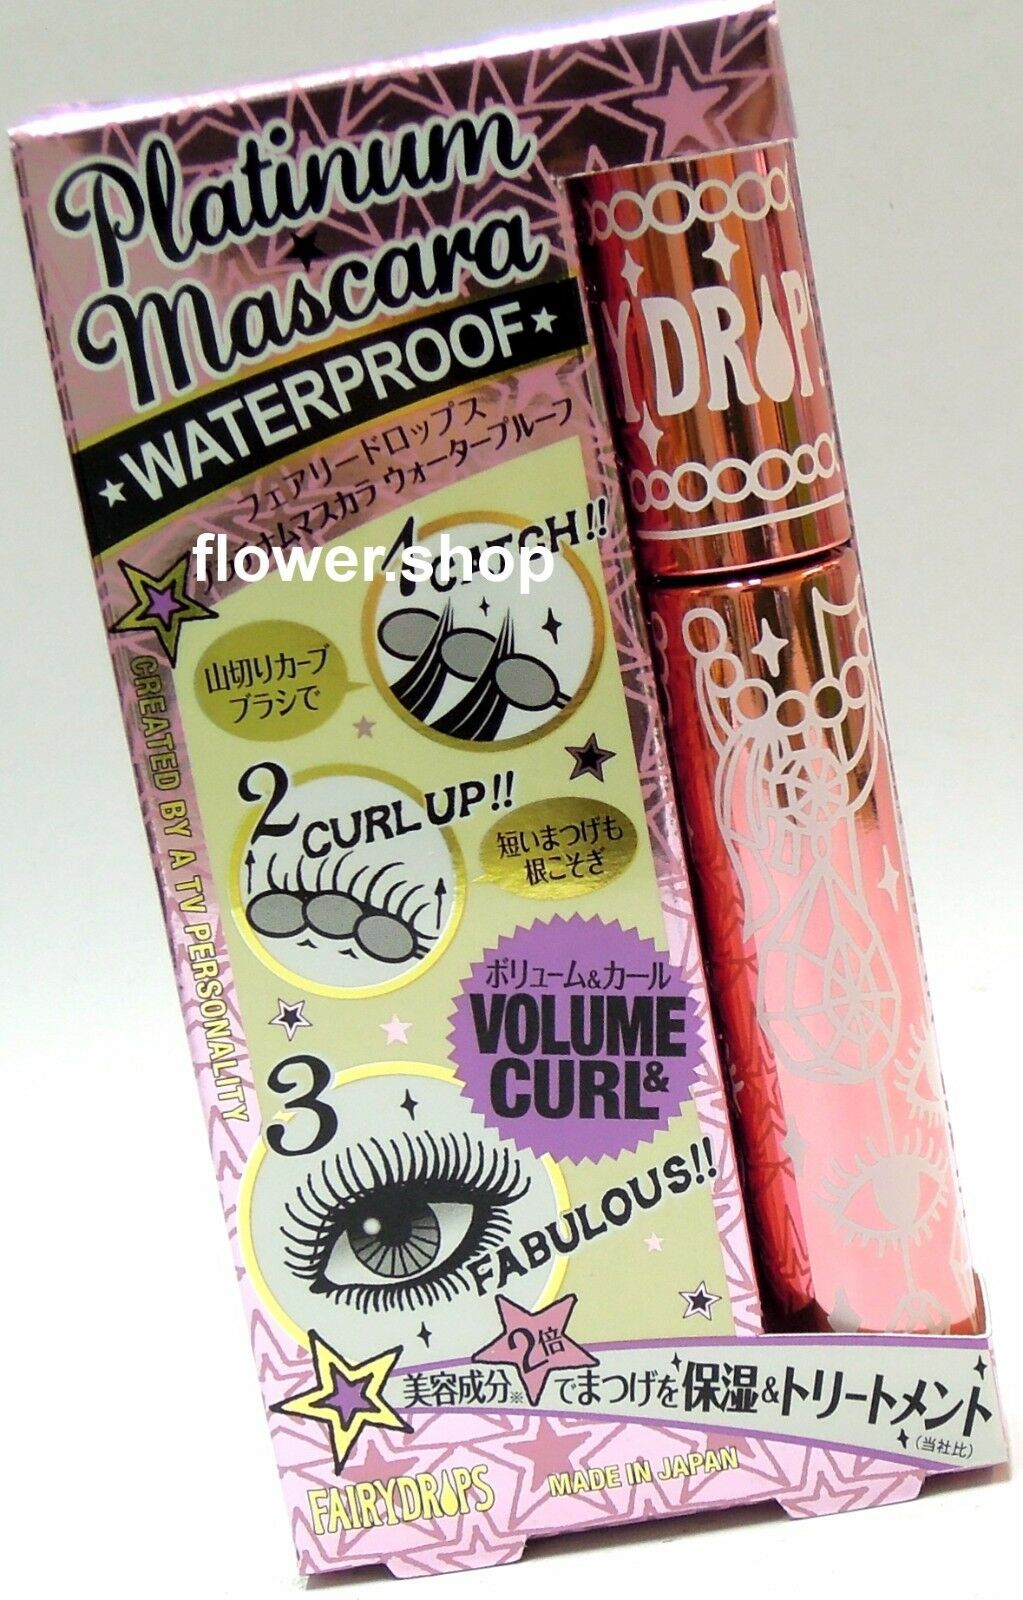 5ed8e284155 Fairy Drops Platinum Mascara Waterproof Type T2 for sale online | eBay